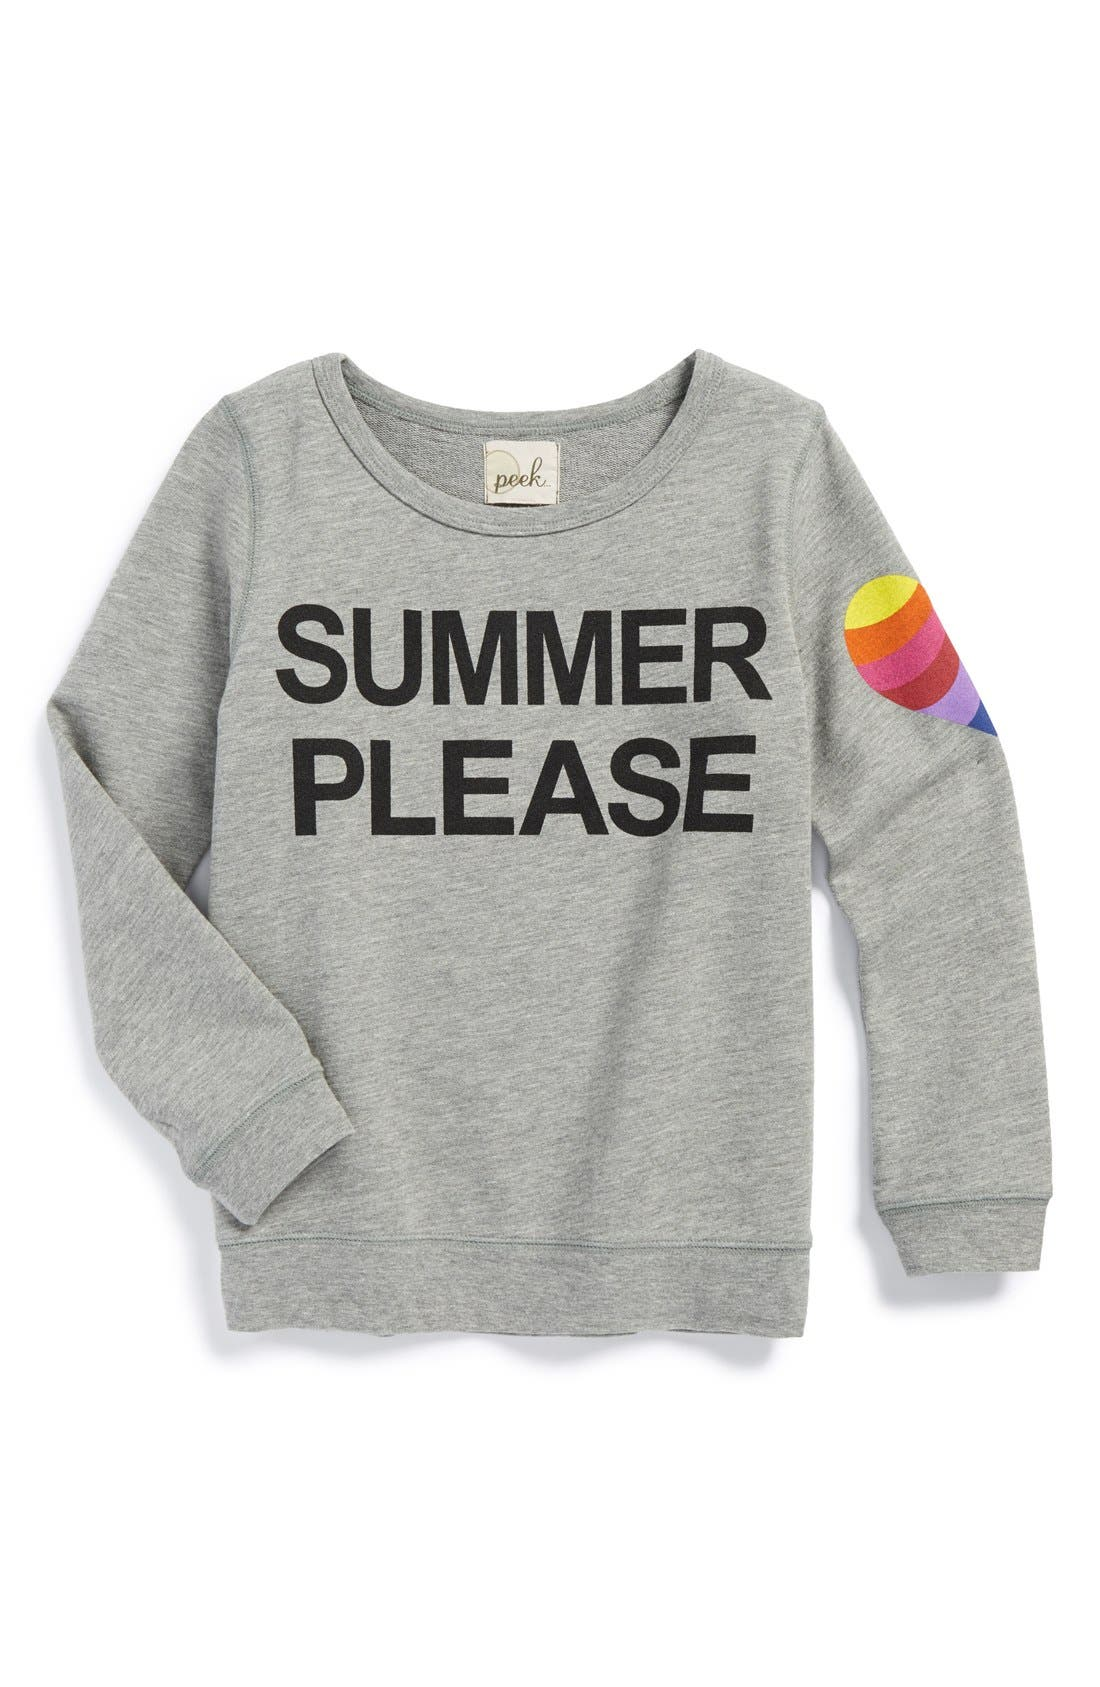 Alternate Image 1 Selected - Peek 'Summer Please' Graphic Sweatshirt (Toddler Girls, Little Girls & Big Girls)